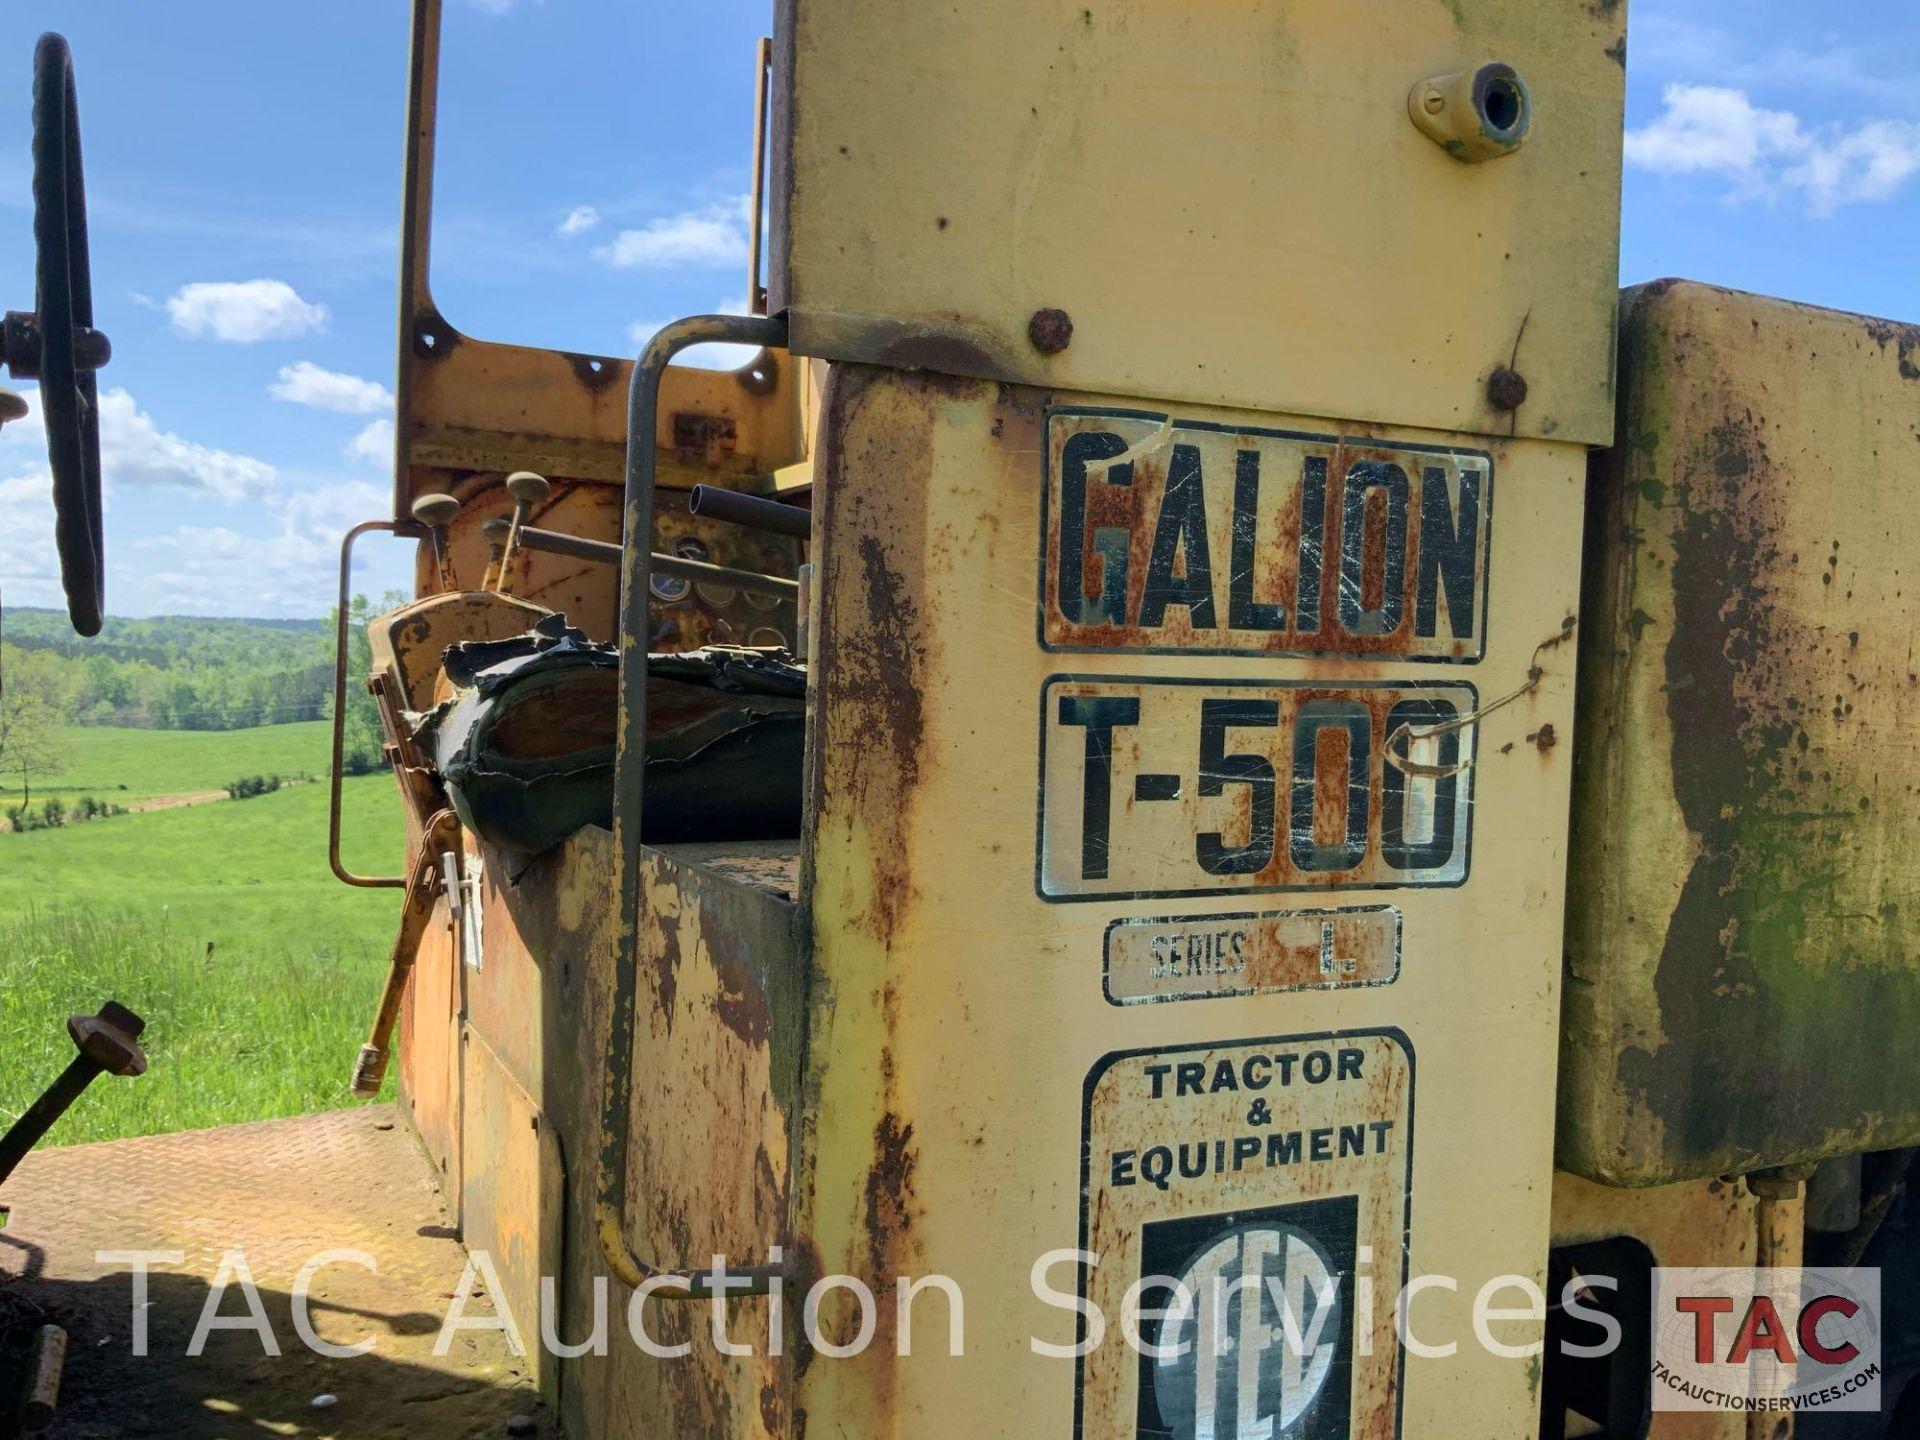 Galion T-500L Motor Grader - Image 26 of 28